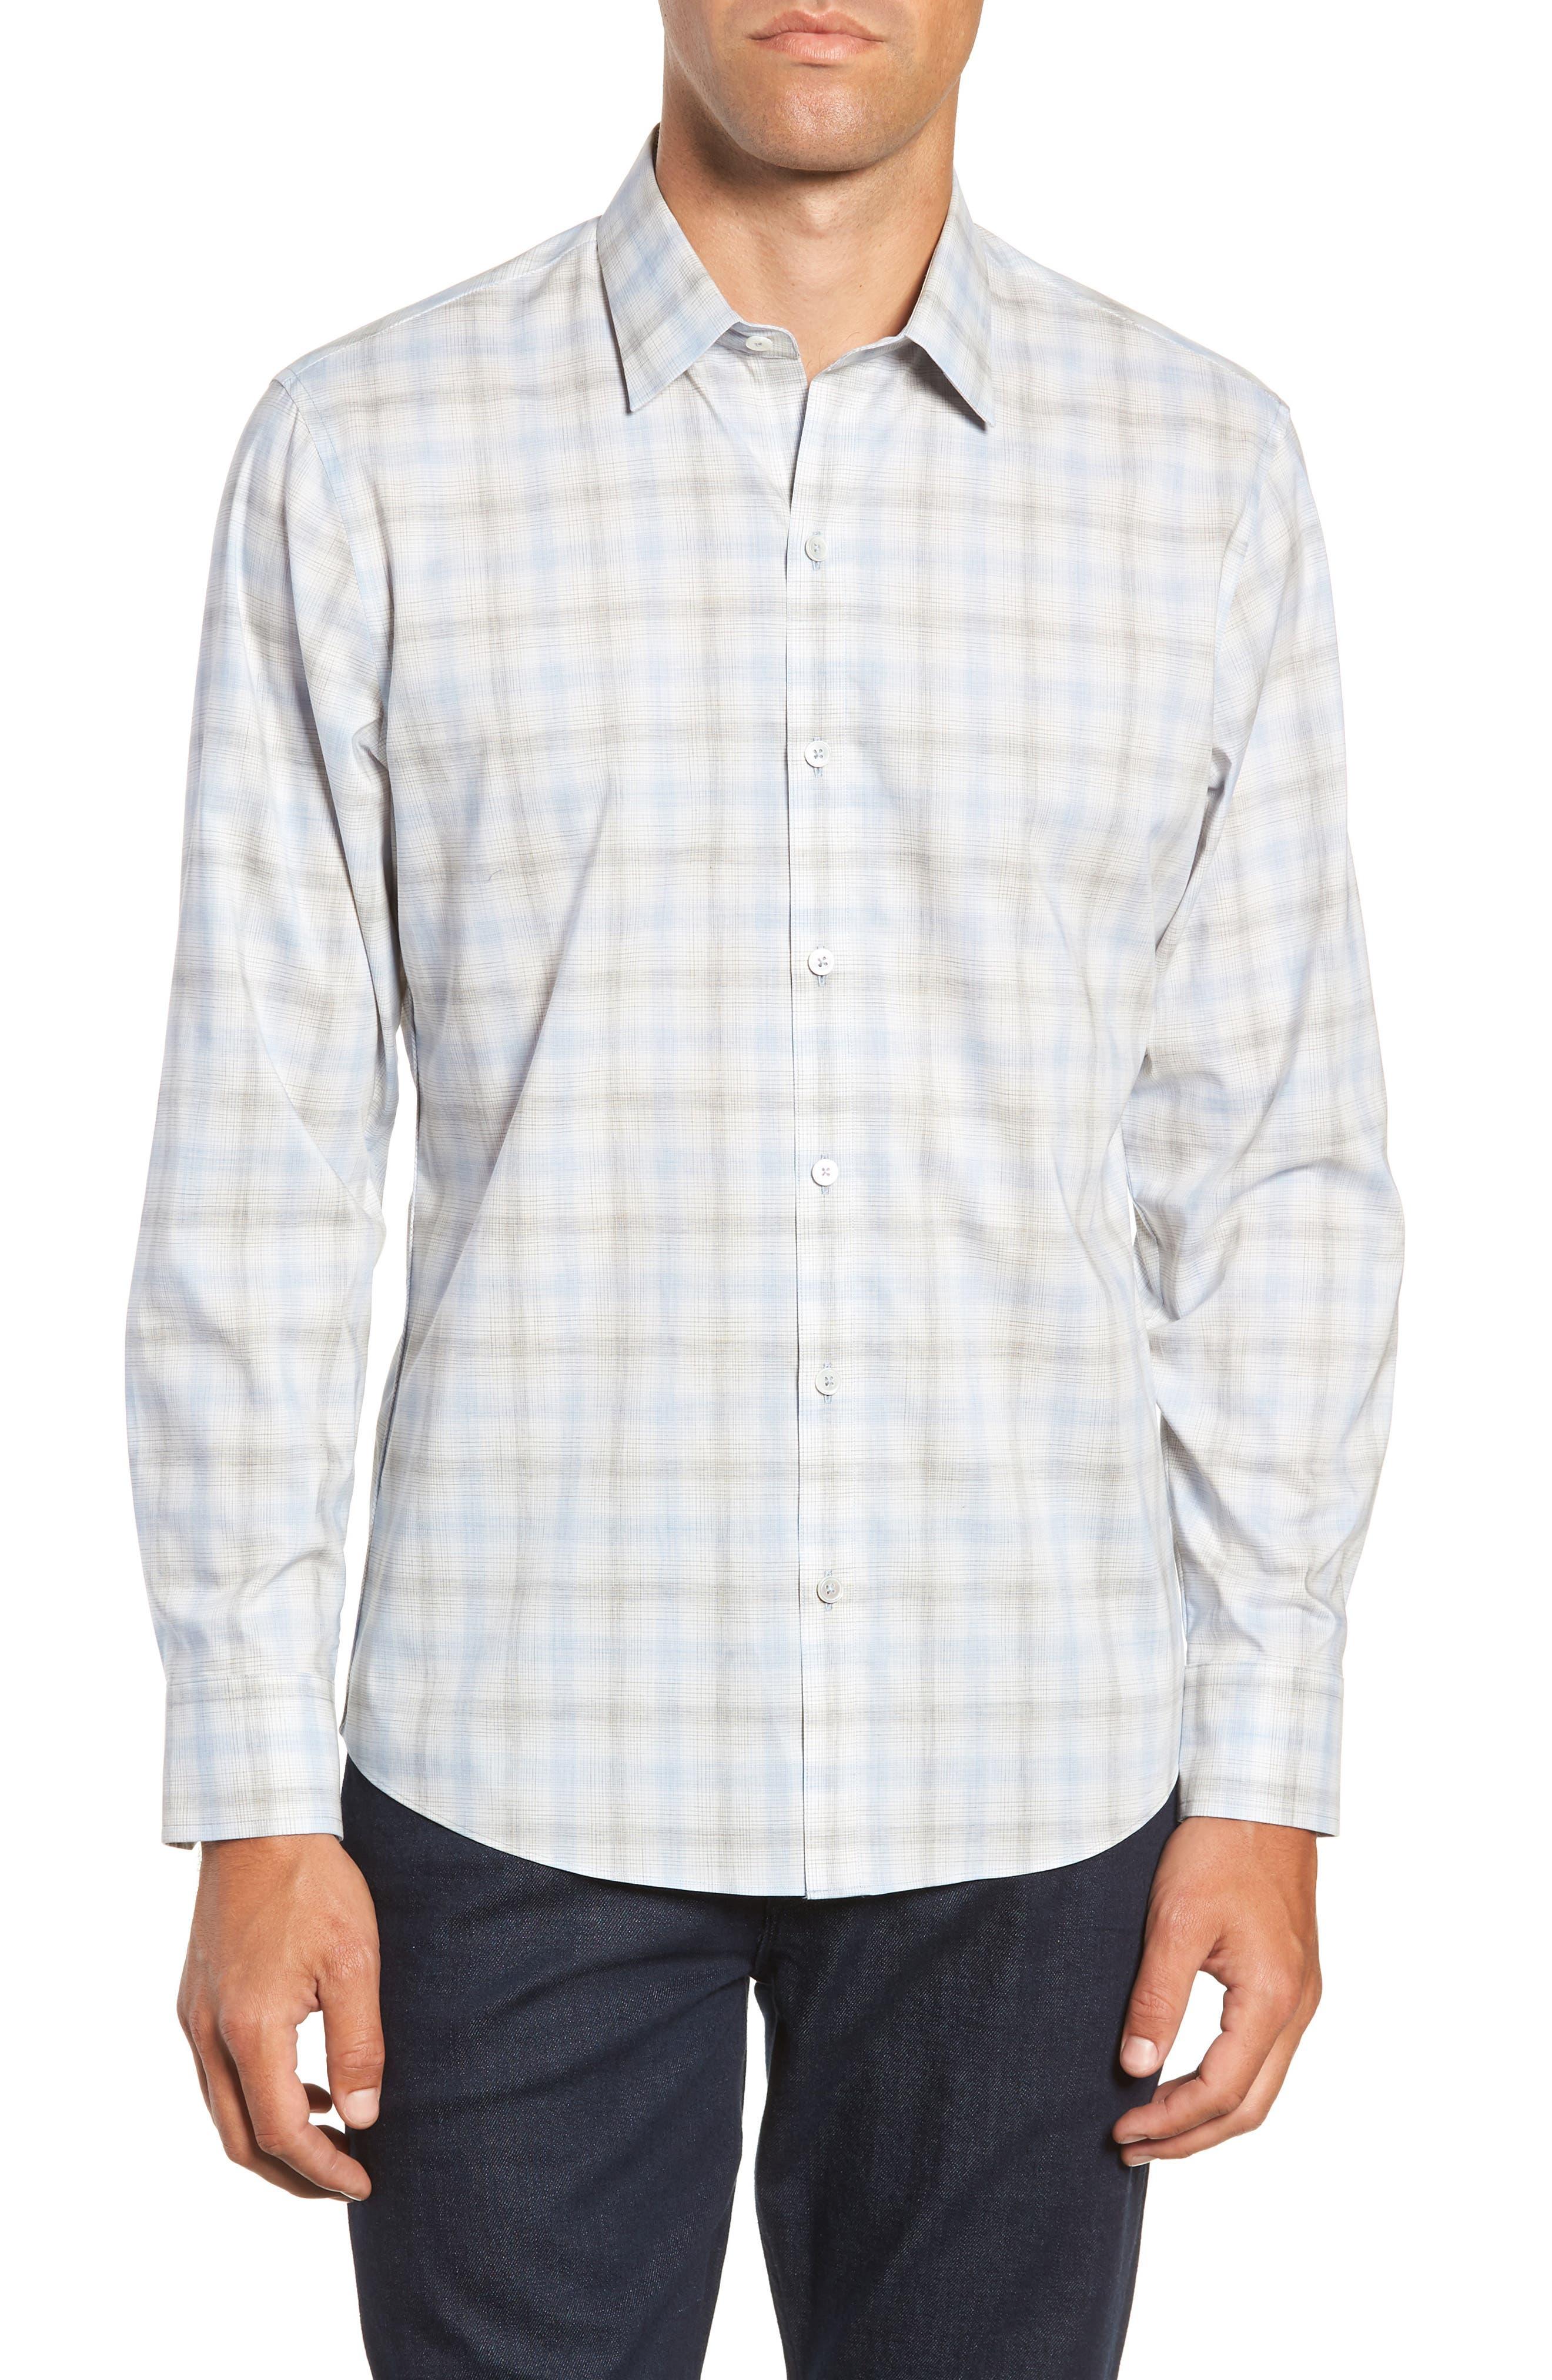 Mourad Regular Fit Sport Shirt,                         Main,                         color, LIGHT GREY